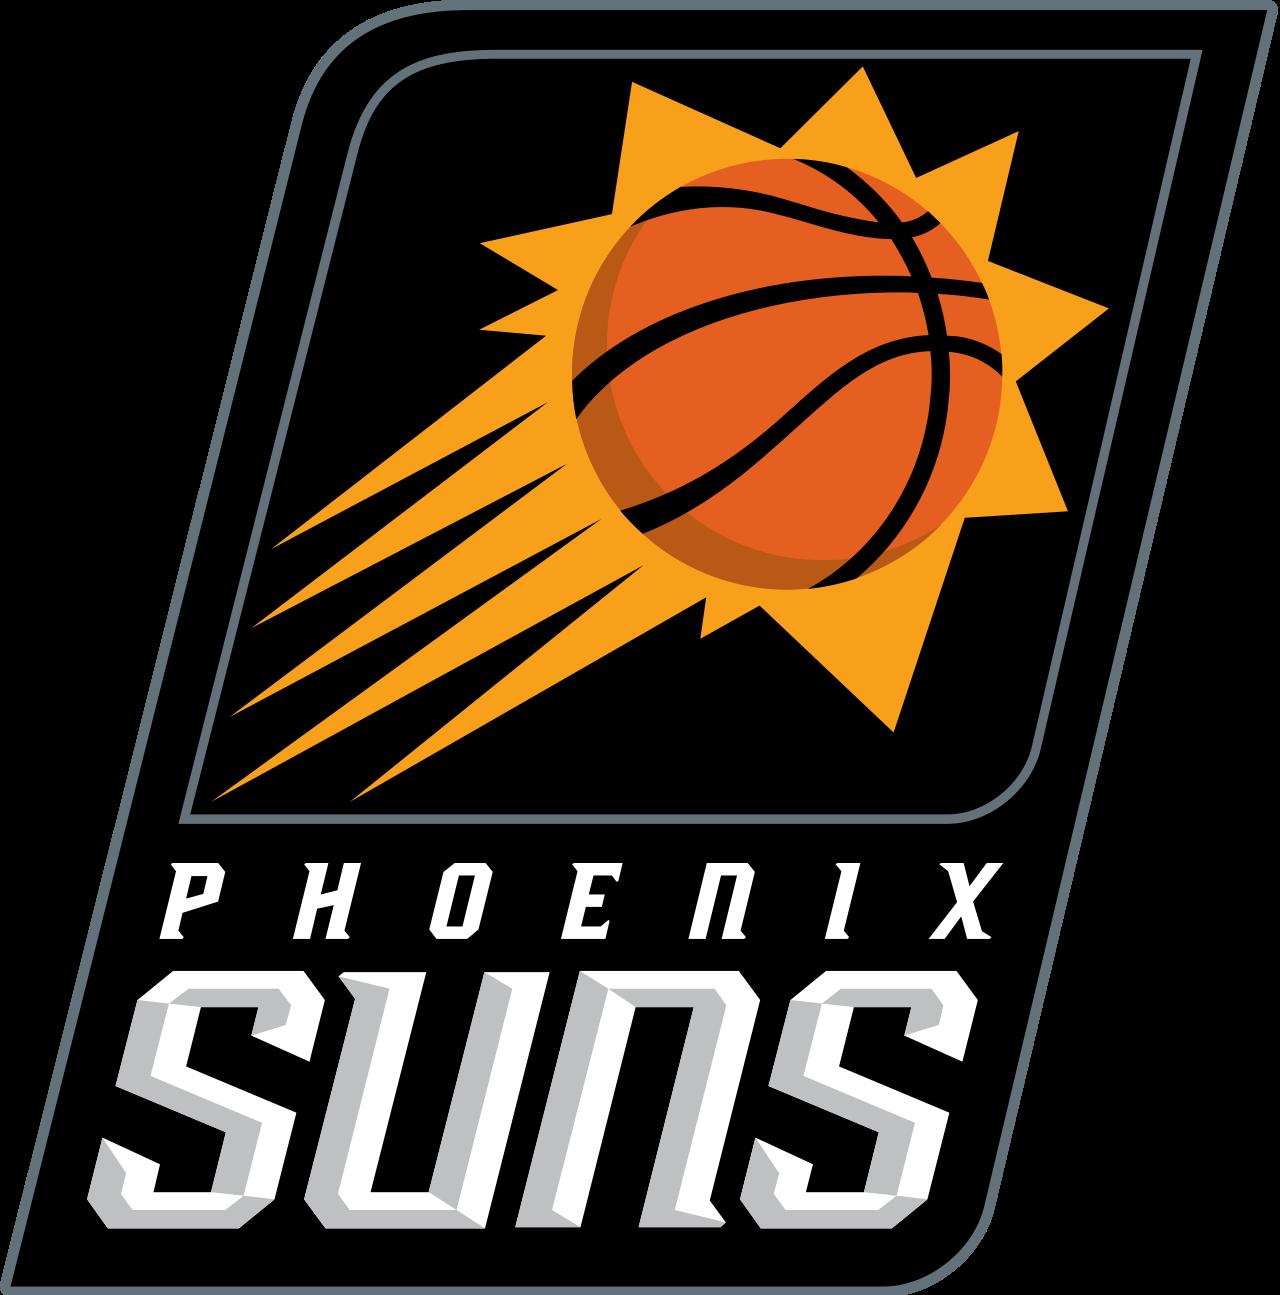 Suns tager hjemmebanefordelen tilbage